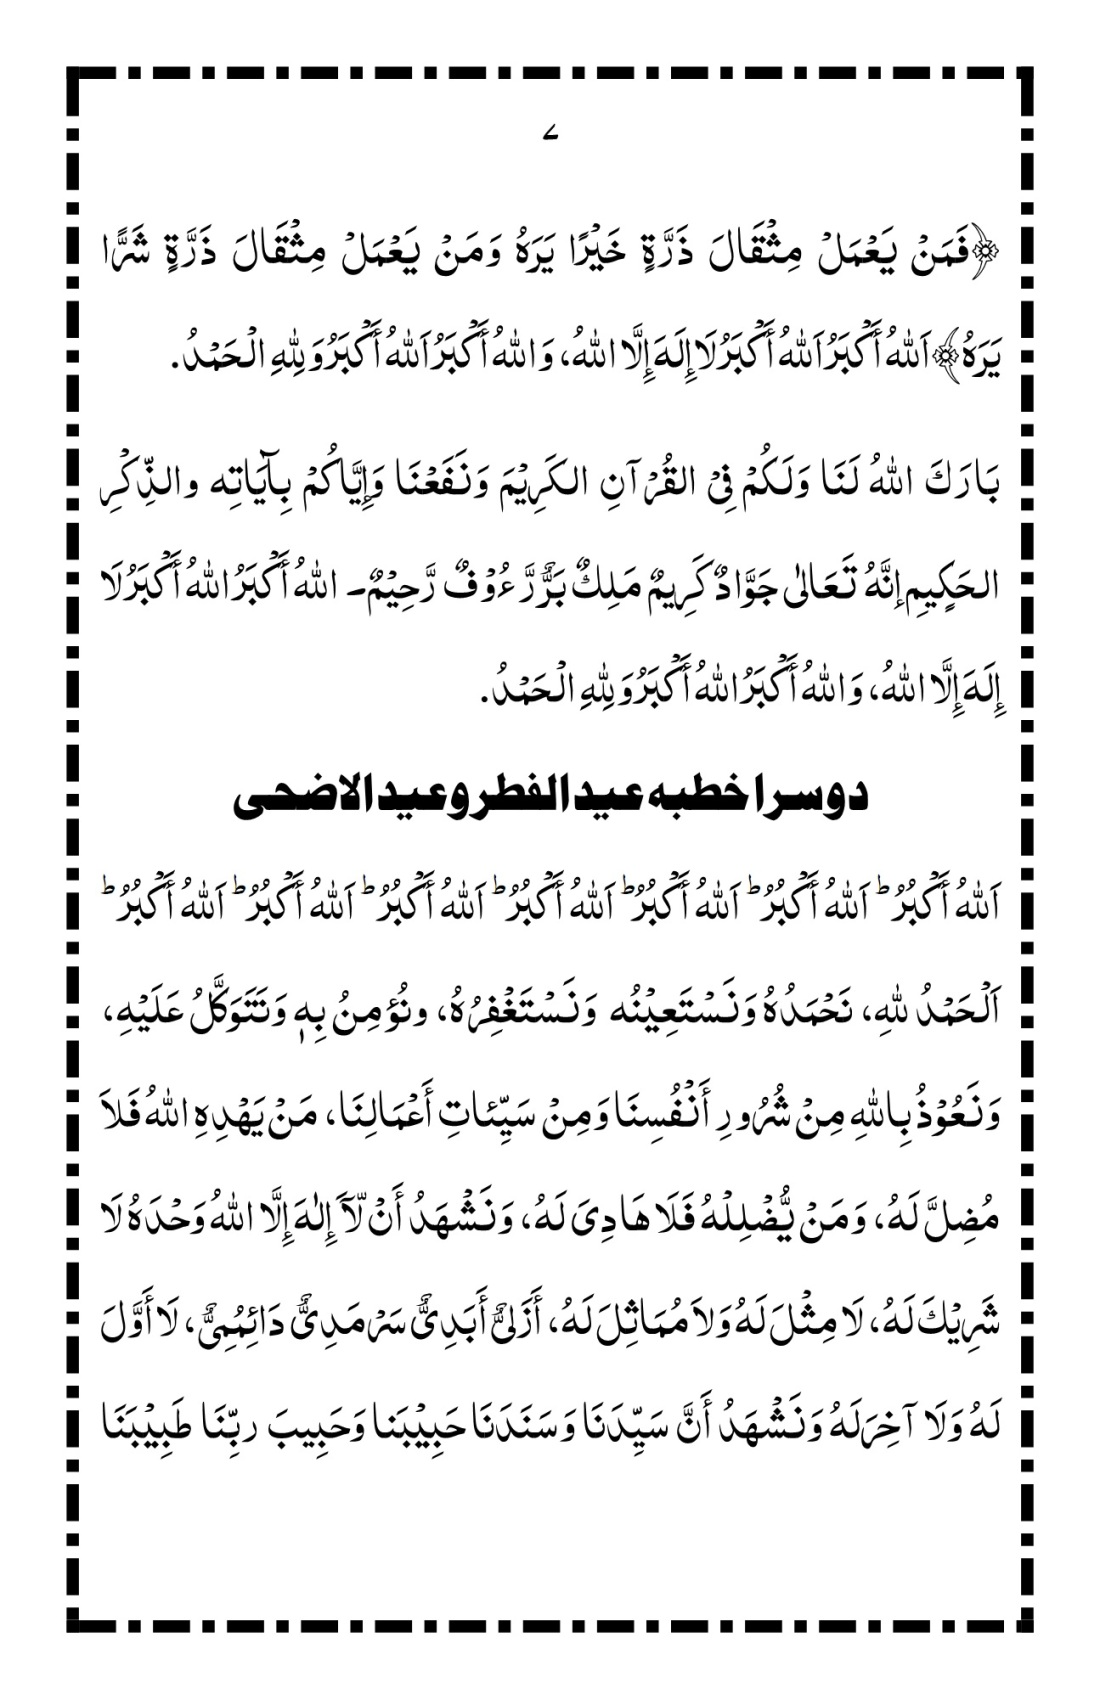 khutba-eif-ul-fitr-adha-2